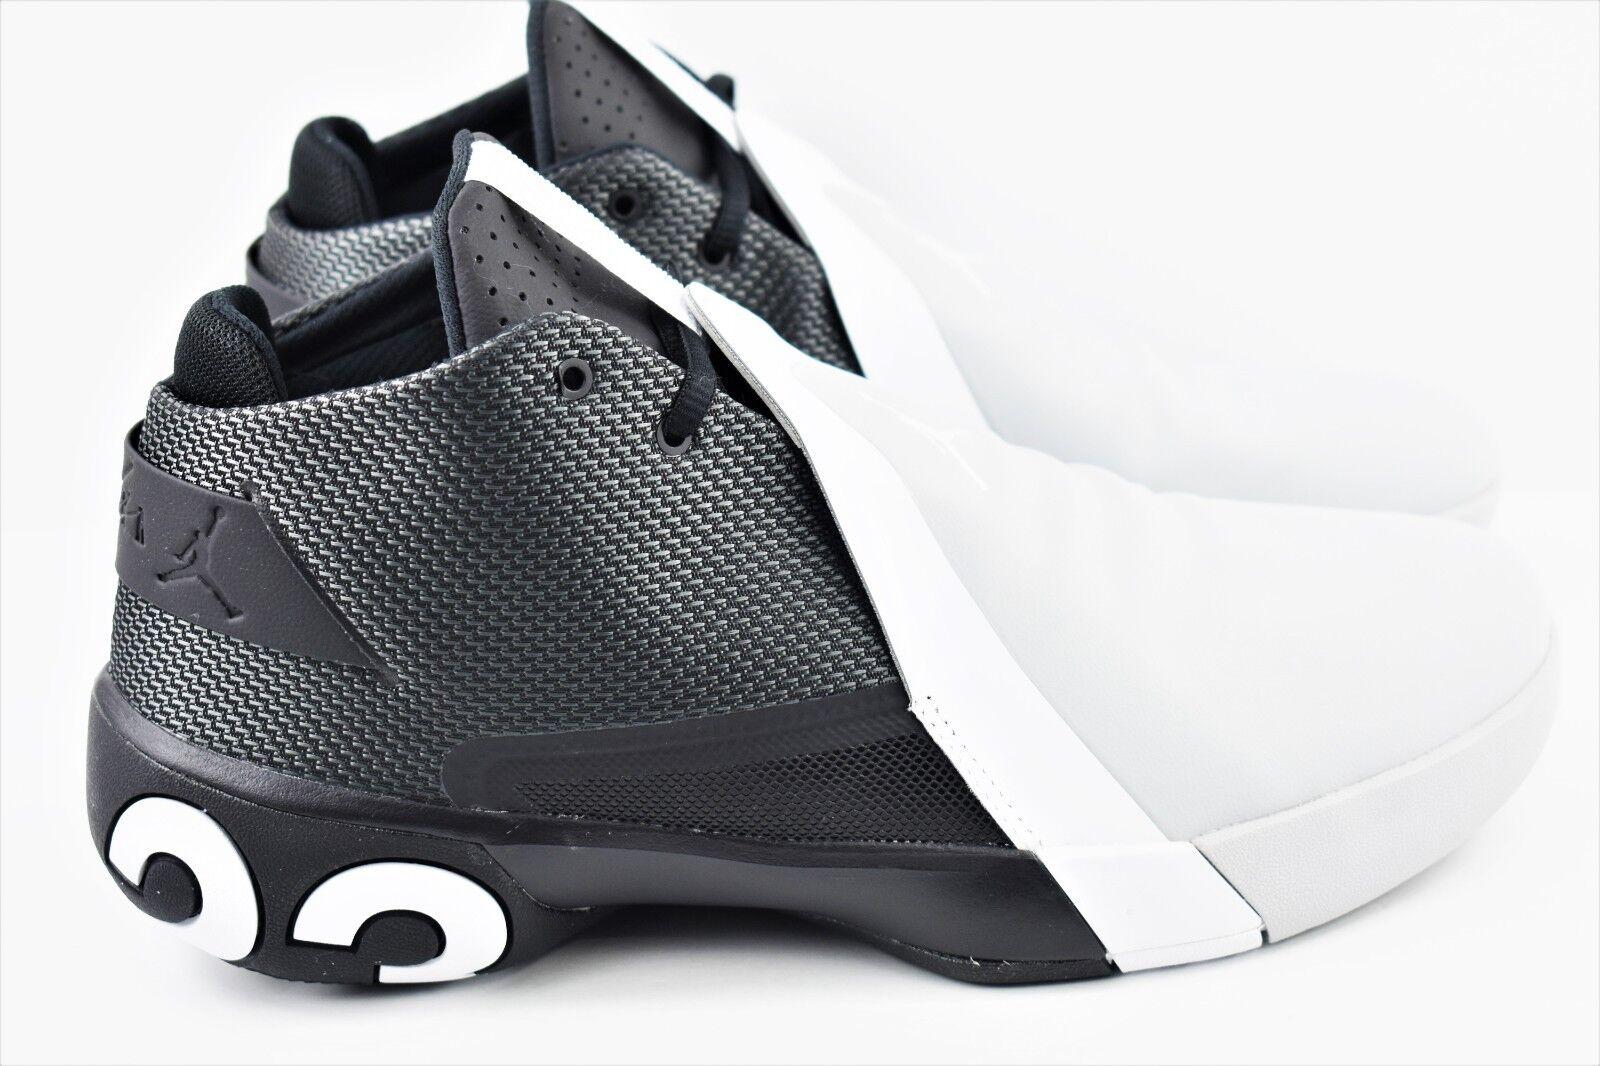 Nike Air Jordan Ultrafly Mens Size 10 Basketball shoes Black Grey AR0044 001